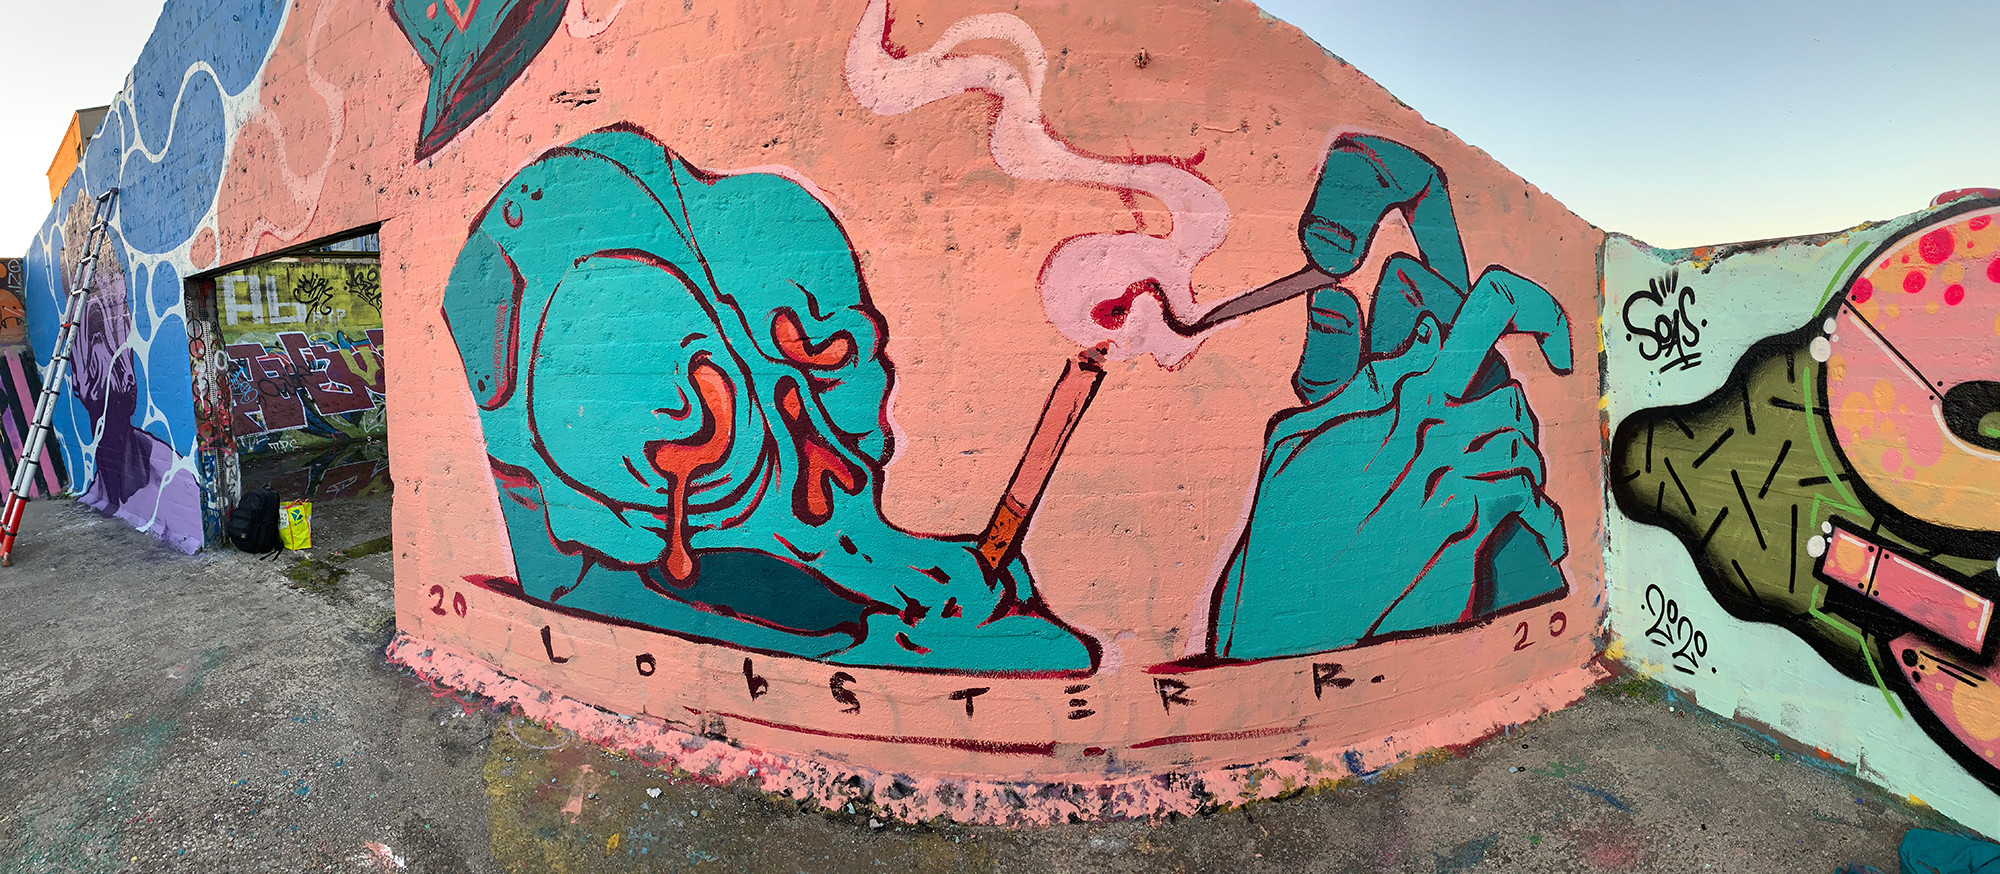 Smoke and tears